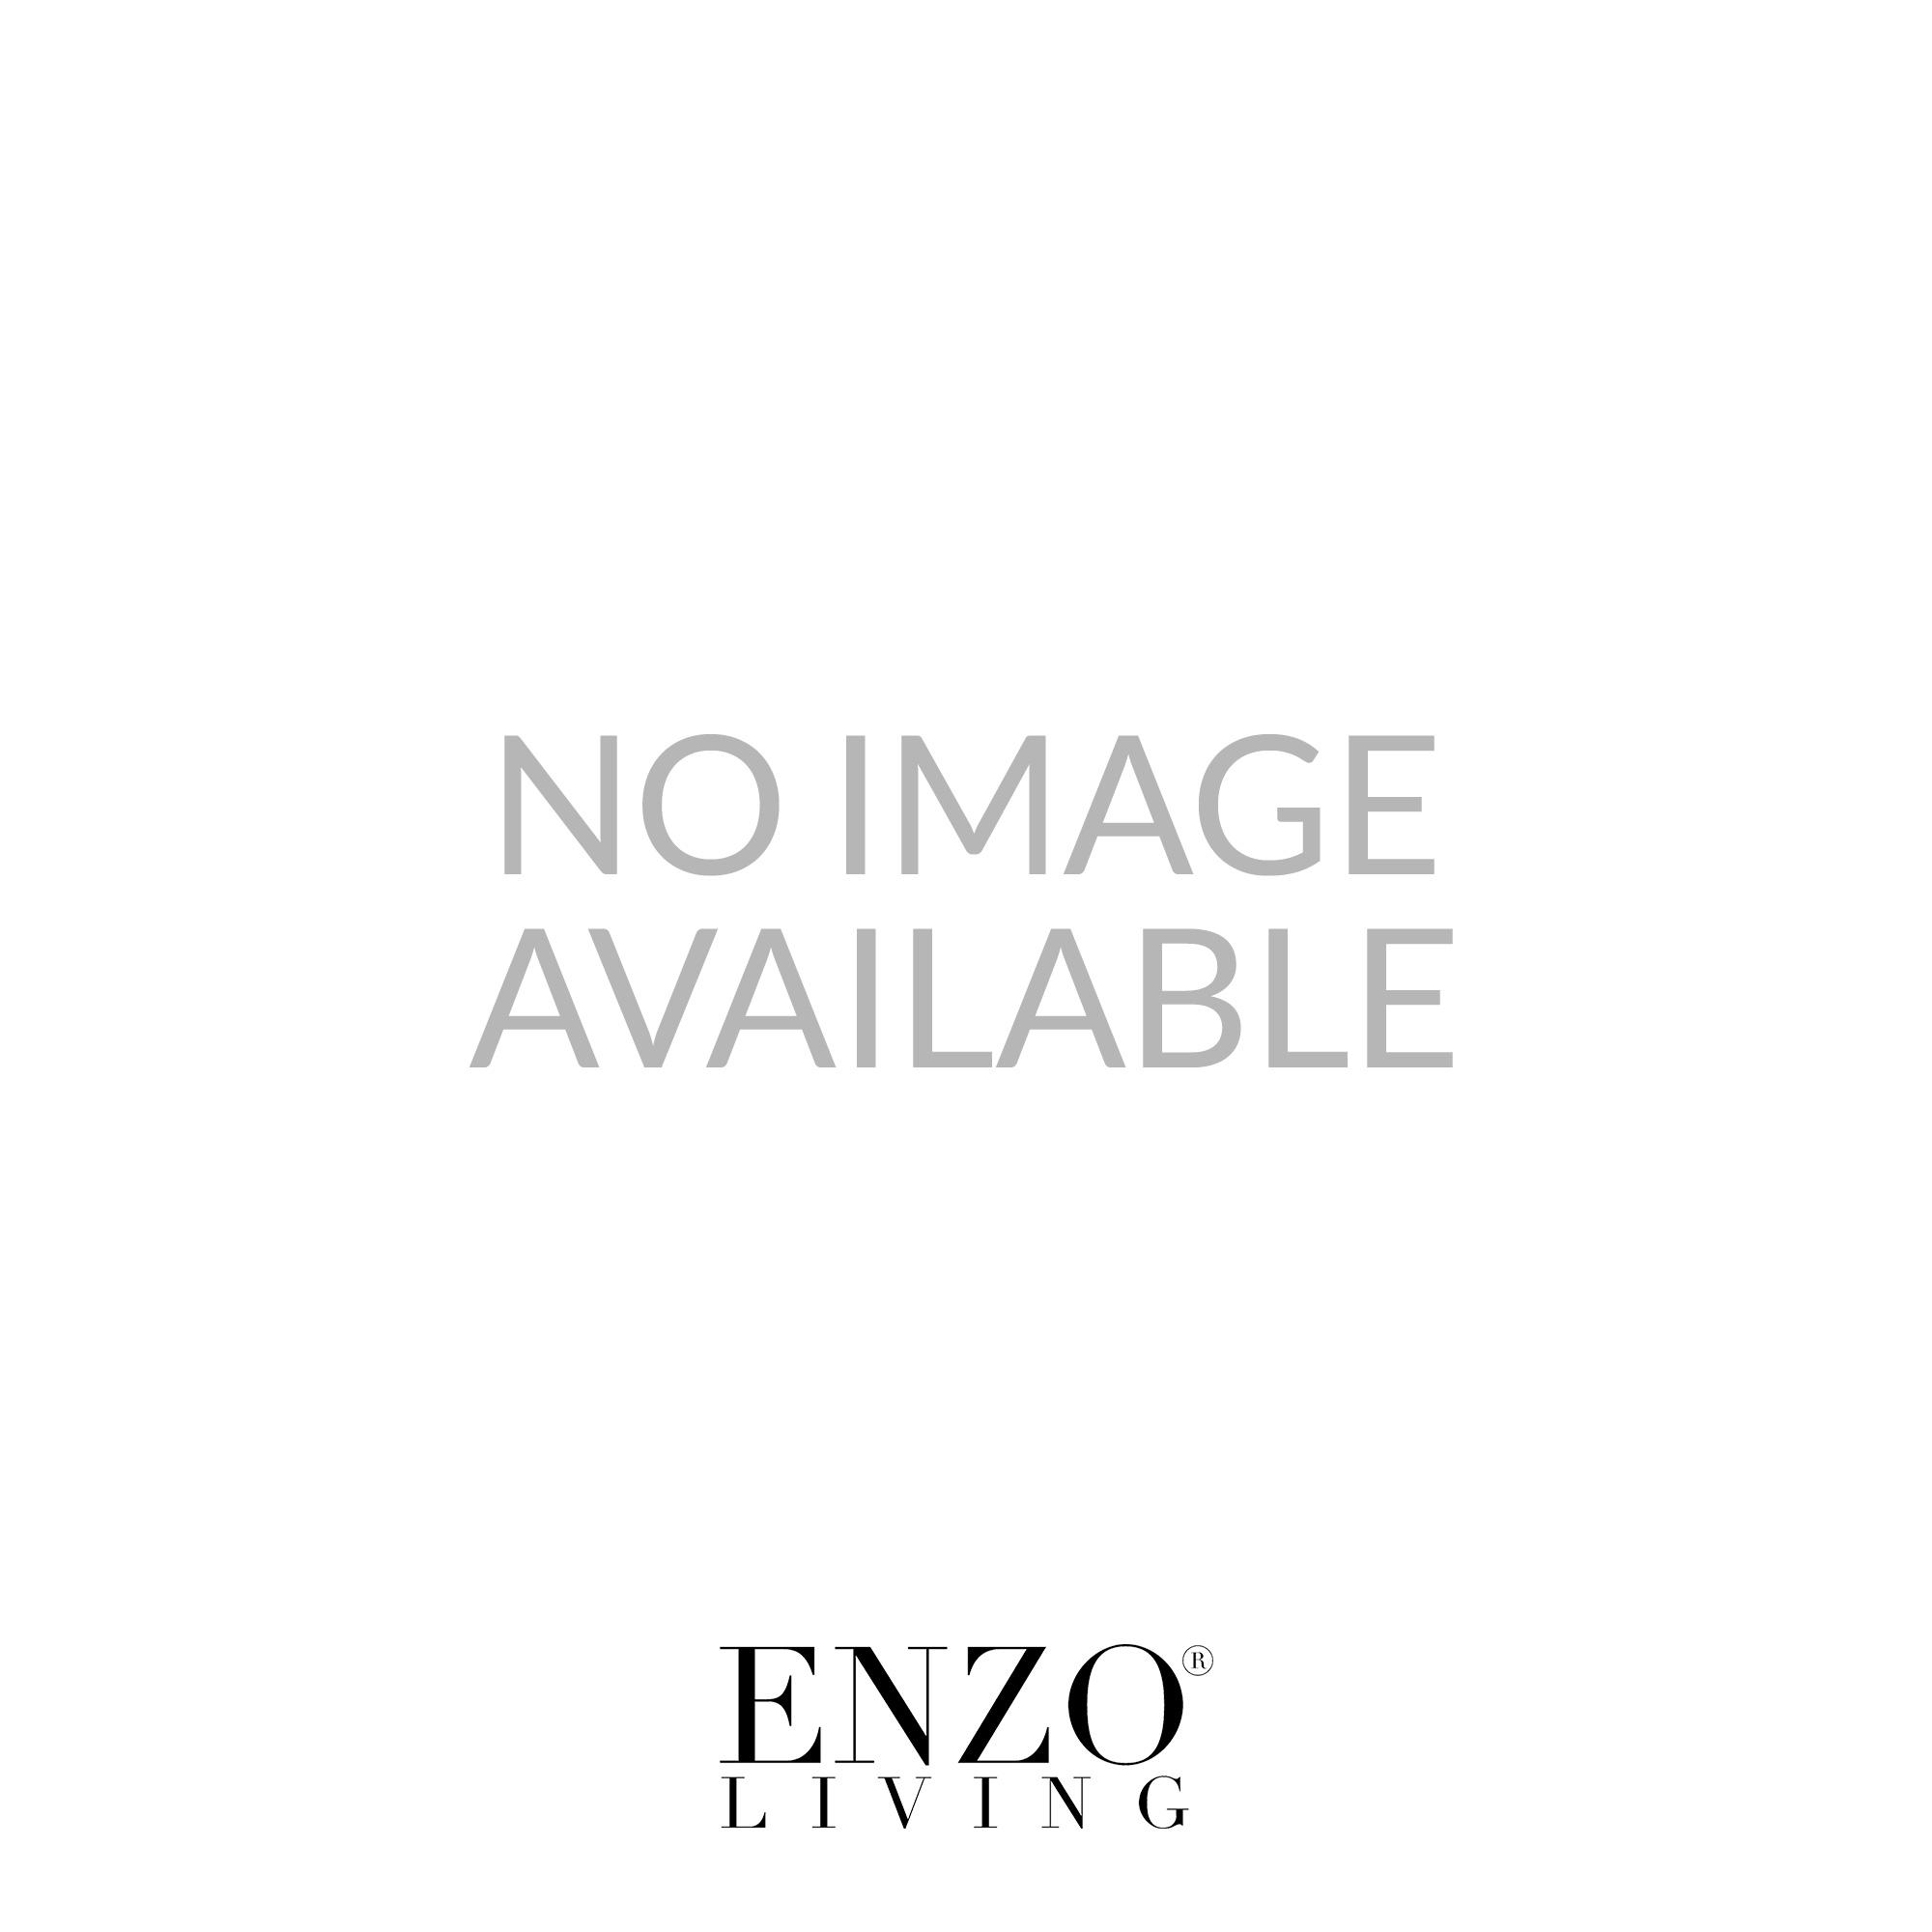 PIZ4975/S1077 PIZA 1 light modern floor lamp black and antique brass finish